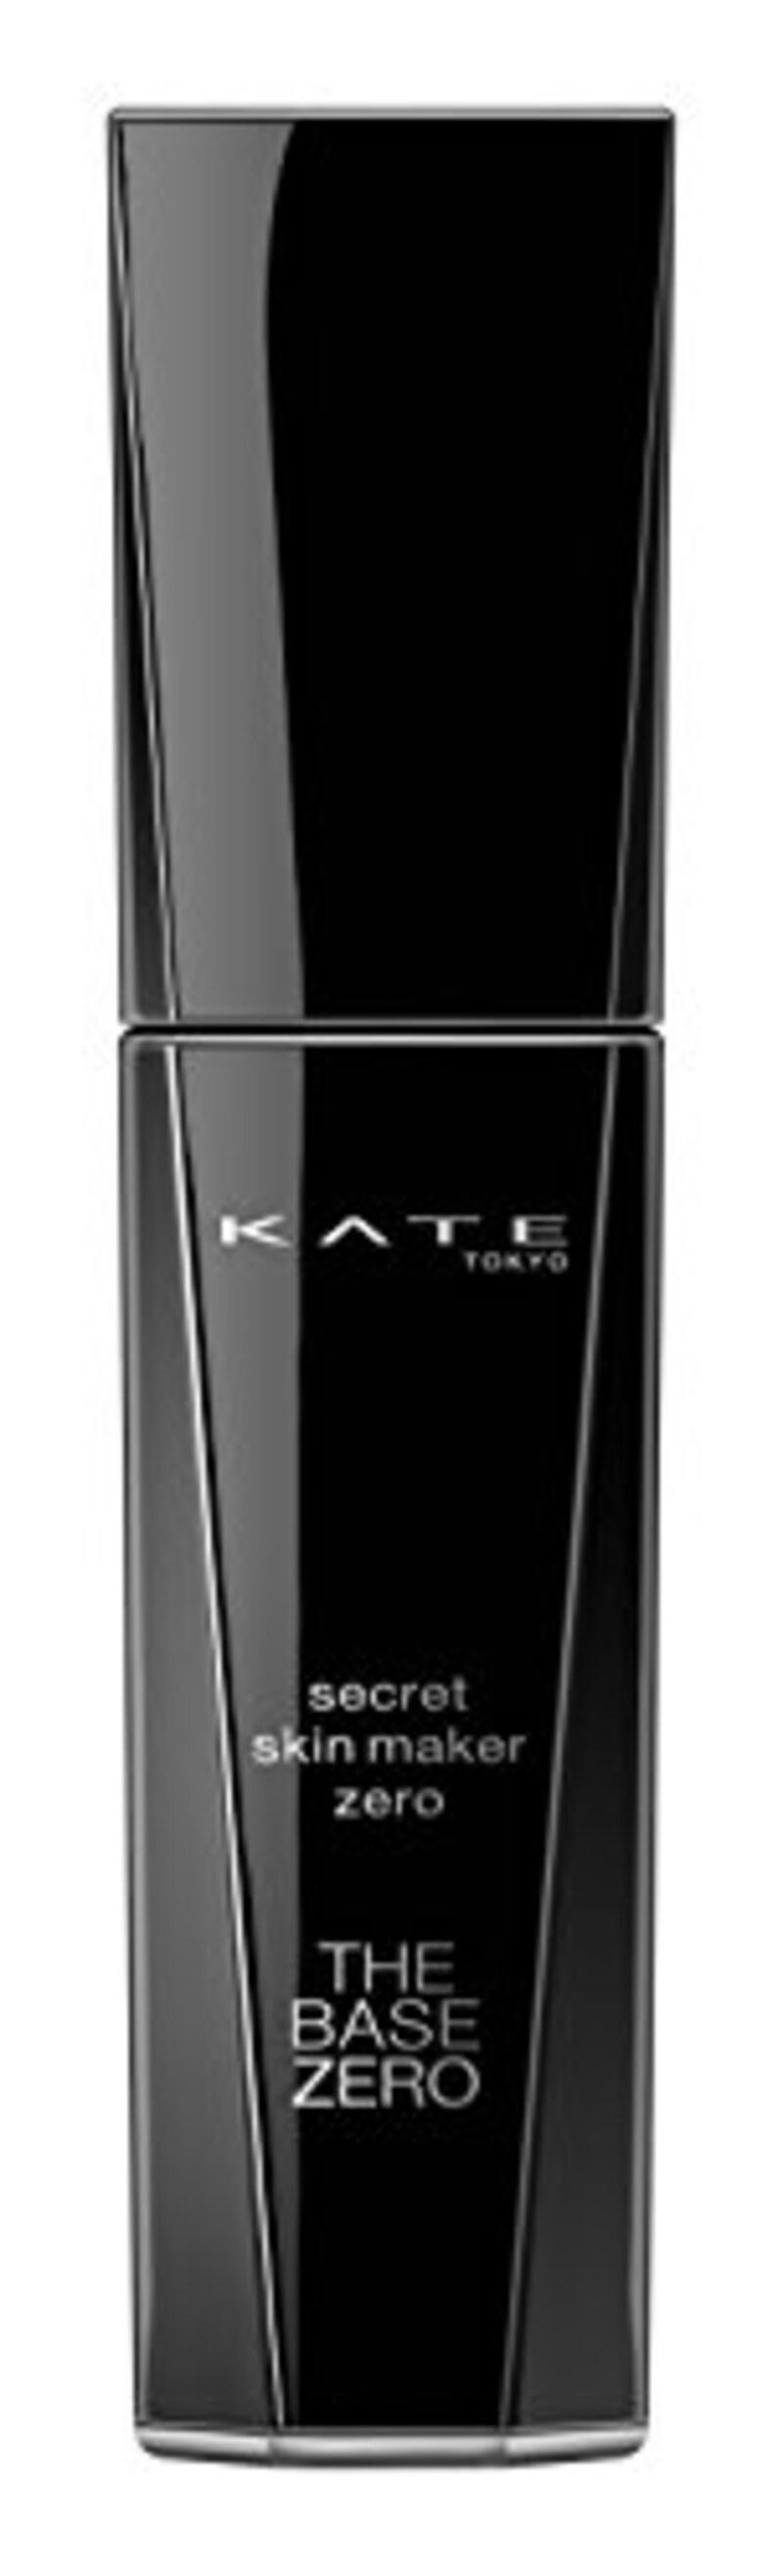 KATE(ケイト),リキッドファンデーション シークレットスキンメイカーゼロ 02